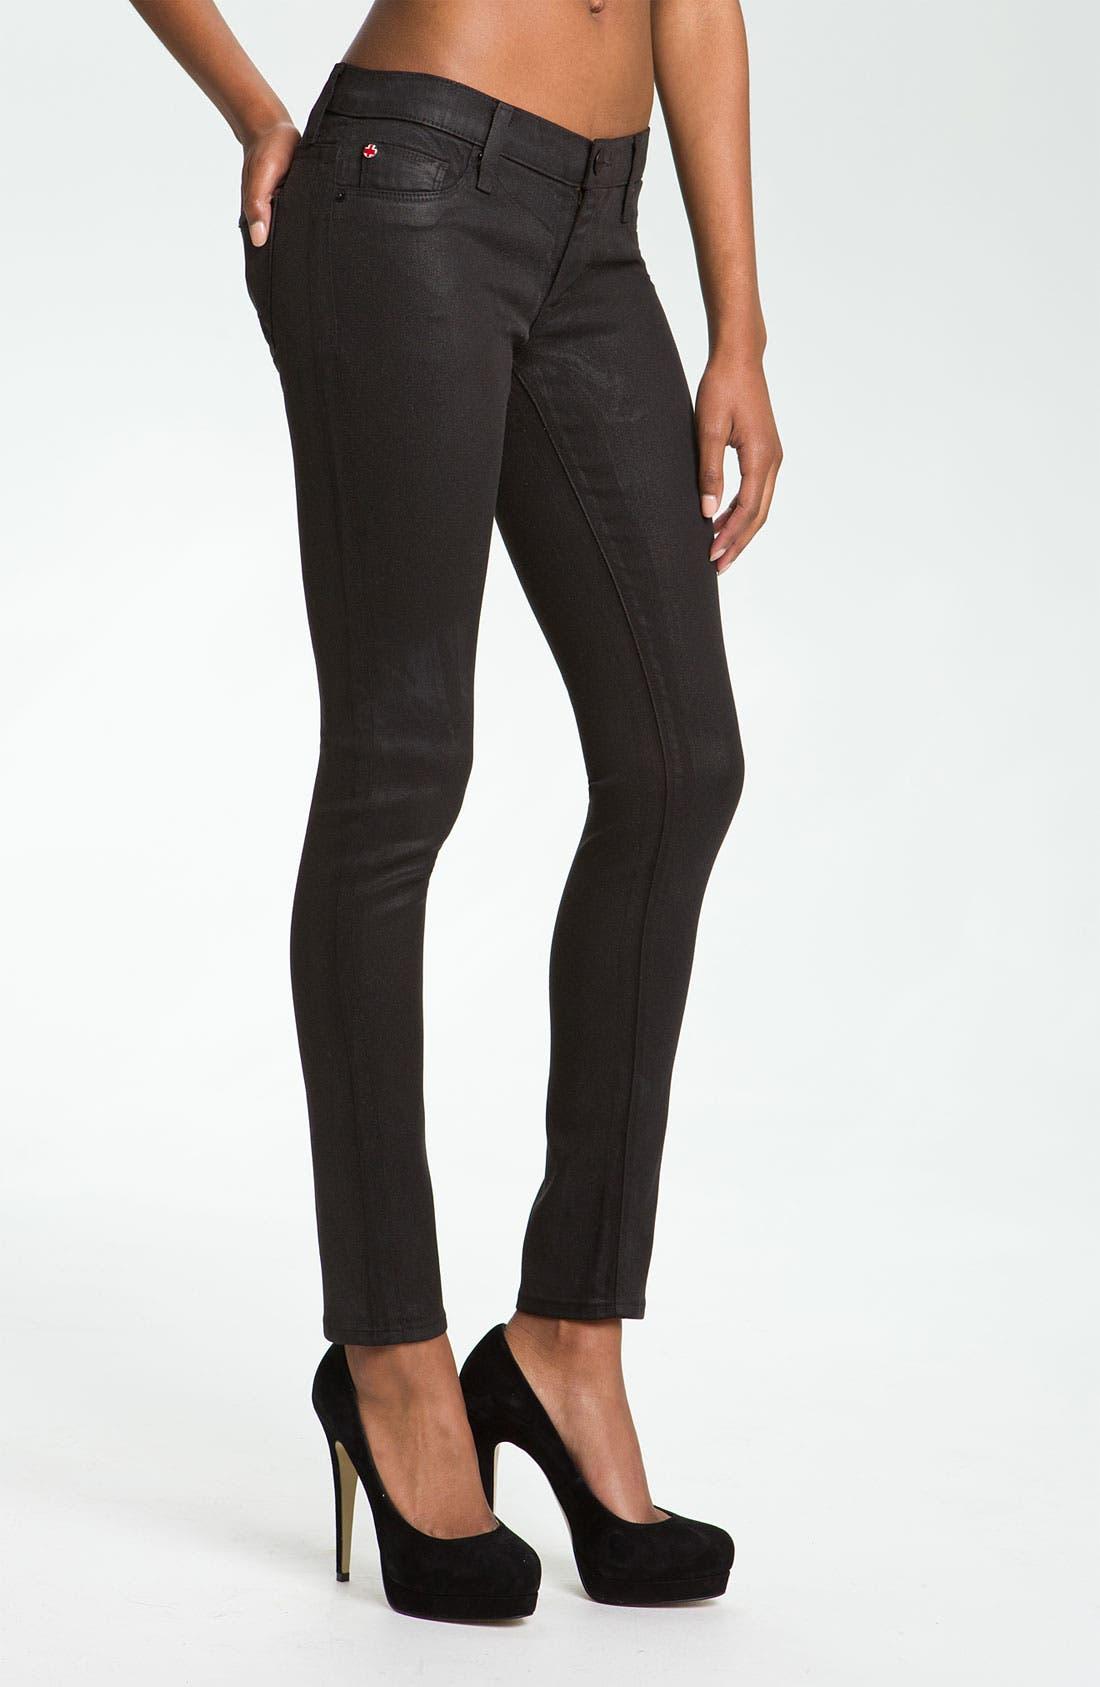 Main Image - Hudson Jeans 'Krista' Super Skinny Jeans (Black Wax)